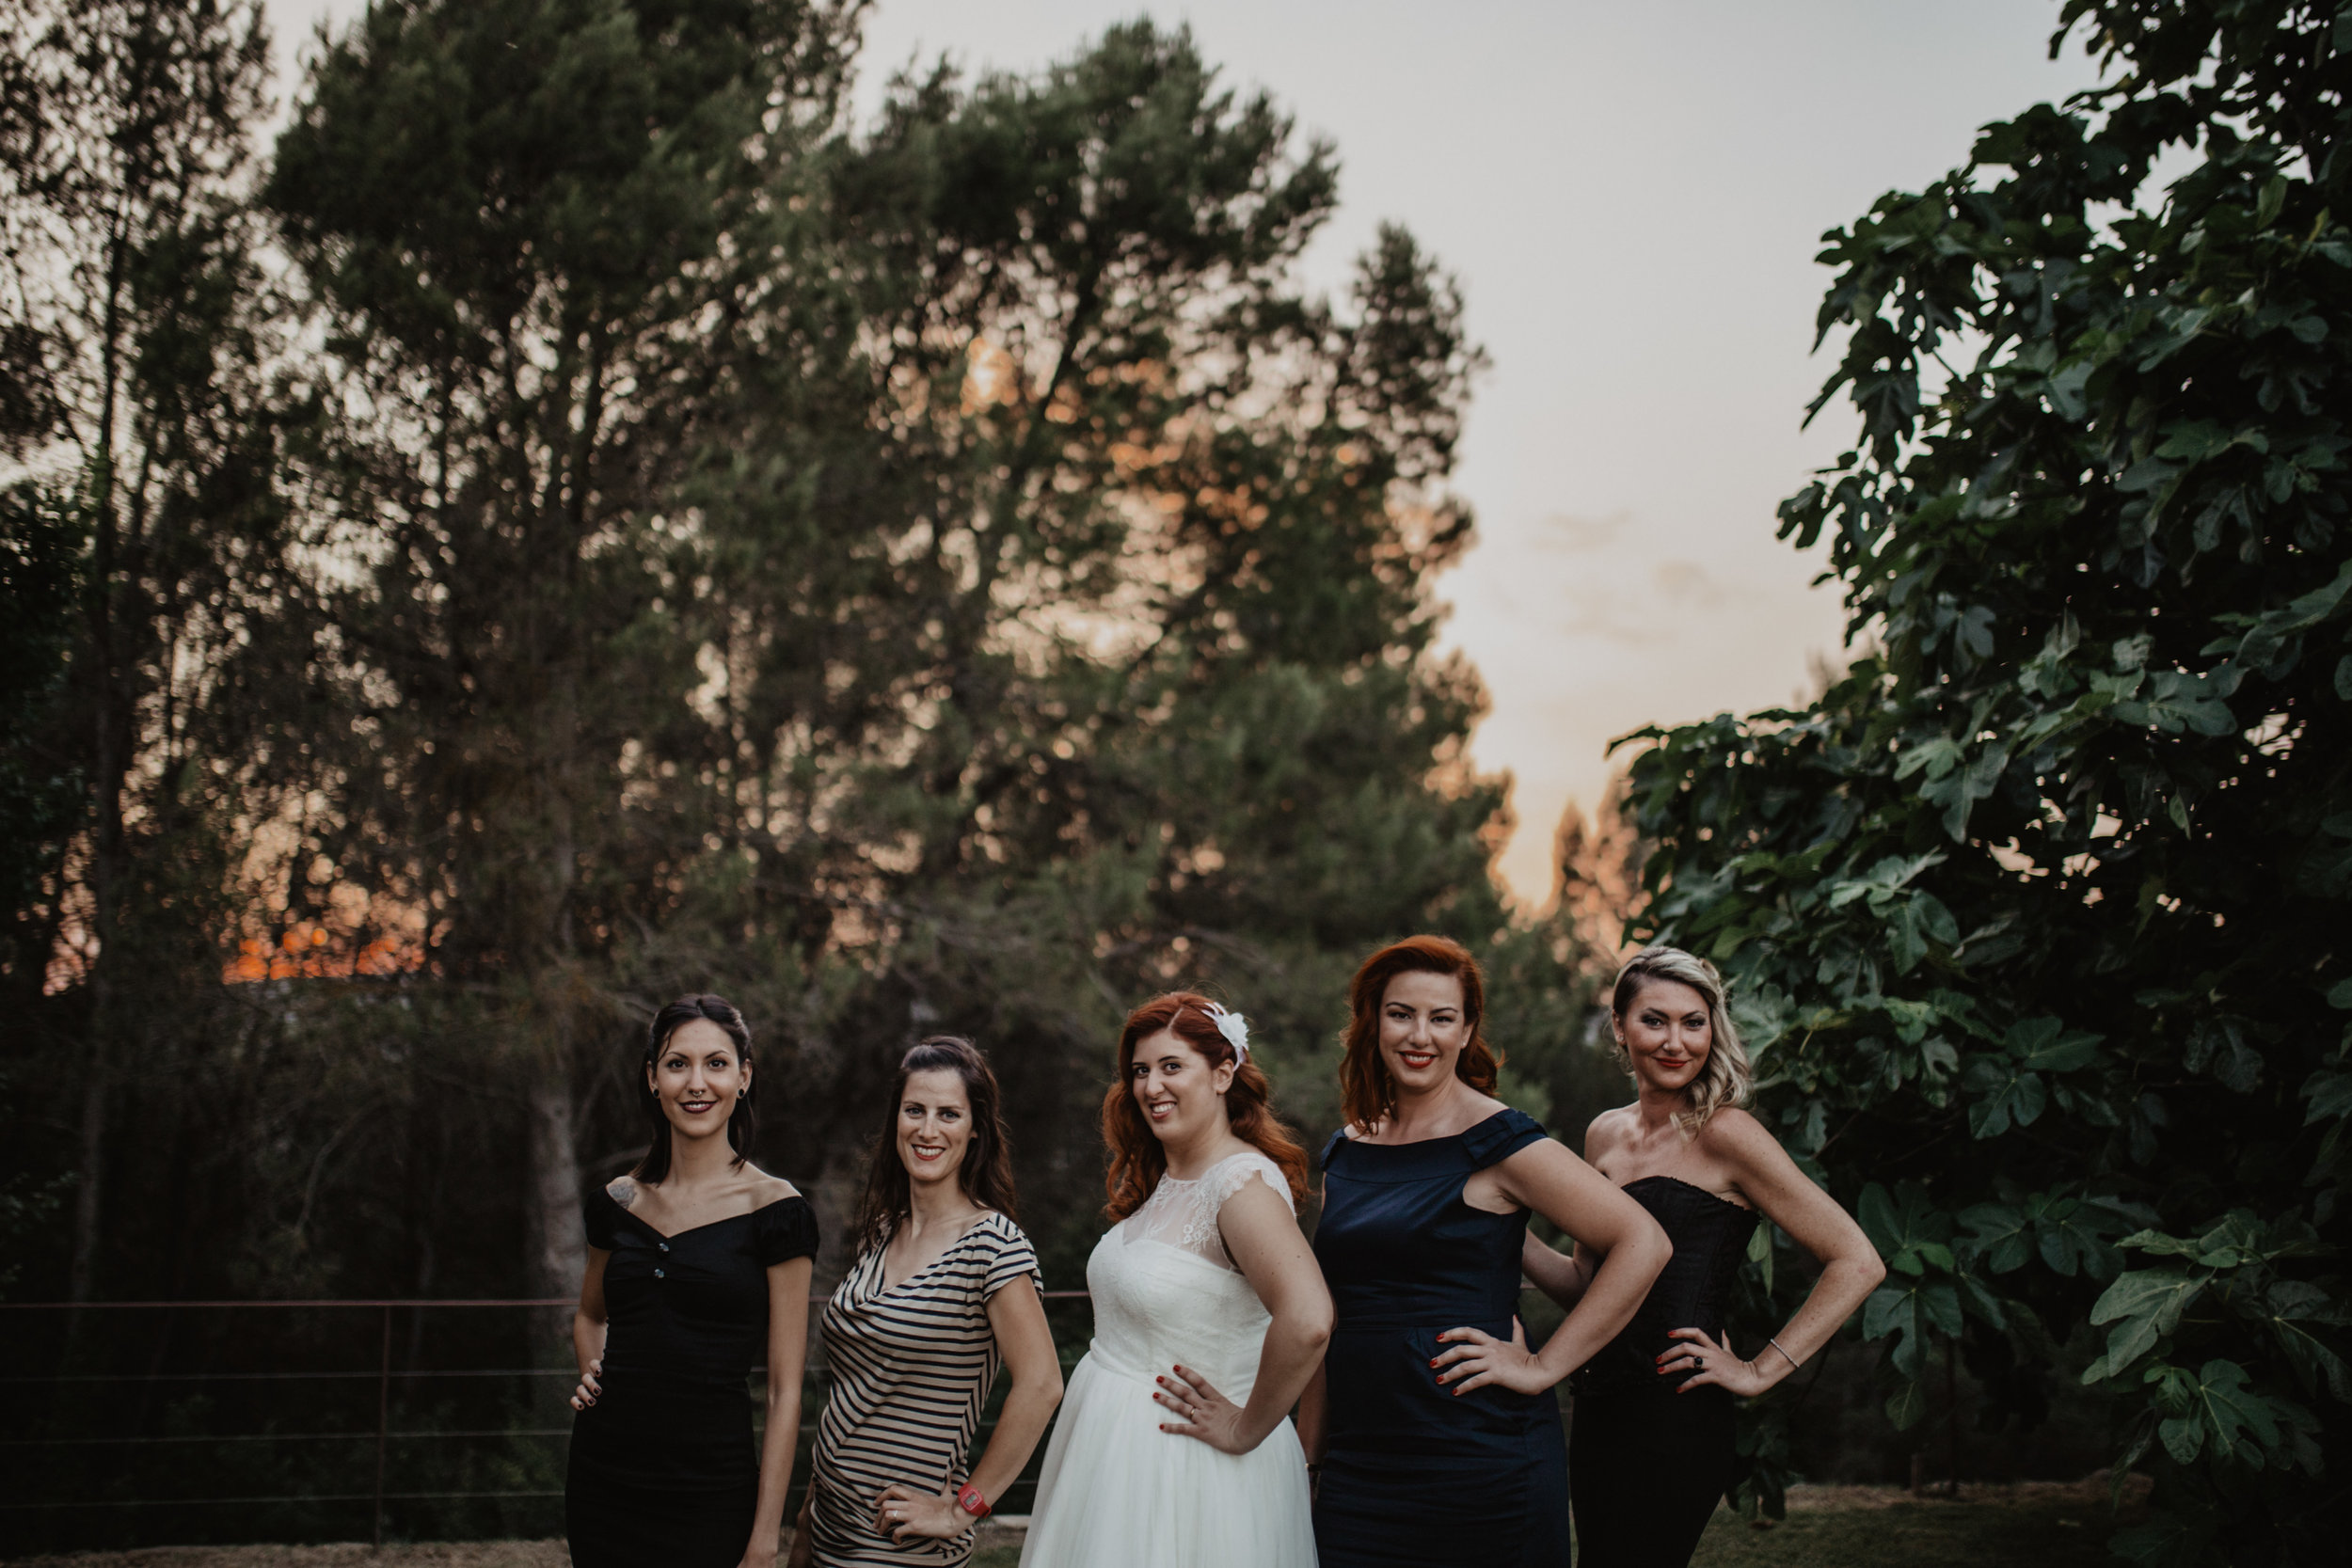 thenortherngirlphotography_photography_thenortherngirl_rebeccascabros_wedding_weddingphotography_masialagarrigadecastelladral_joaniemma_bodaenbarcelona_weddingphotographer_emmaijoan-688.jpg